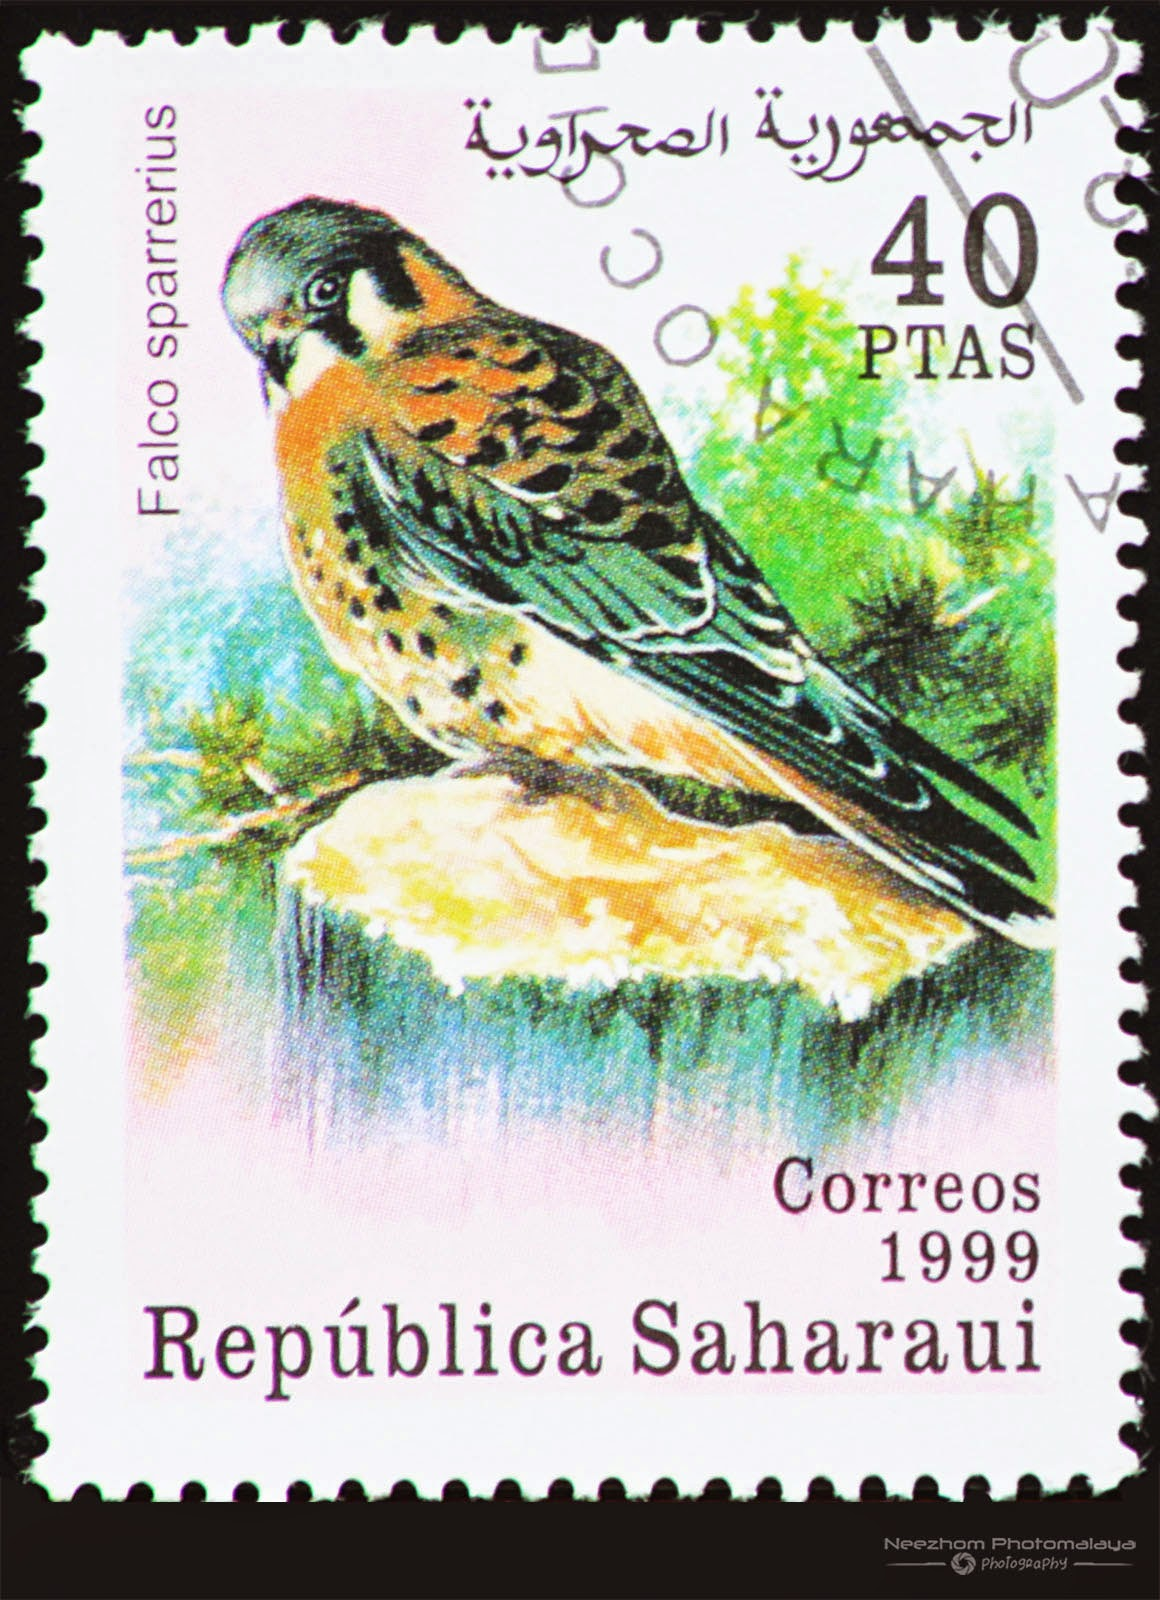 Western Sahara 1999 Birds of Prey stamp - American Kestrel (Falco sparrerius) 40 ptas